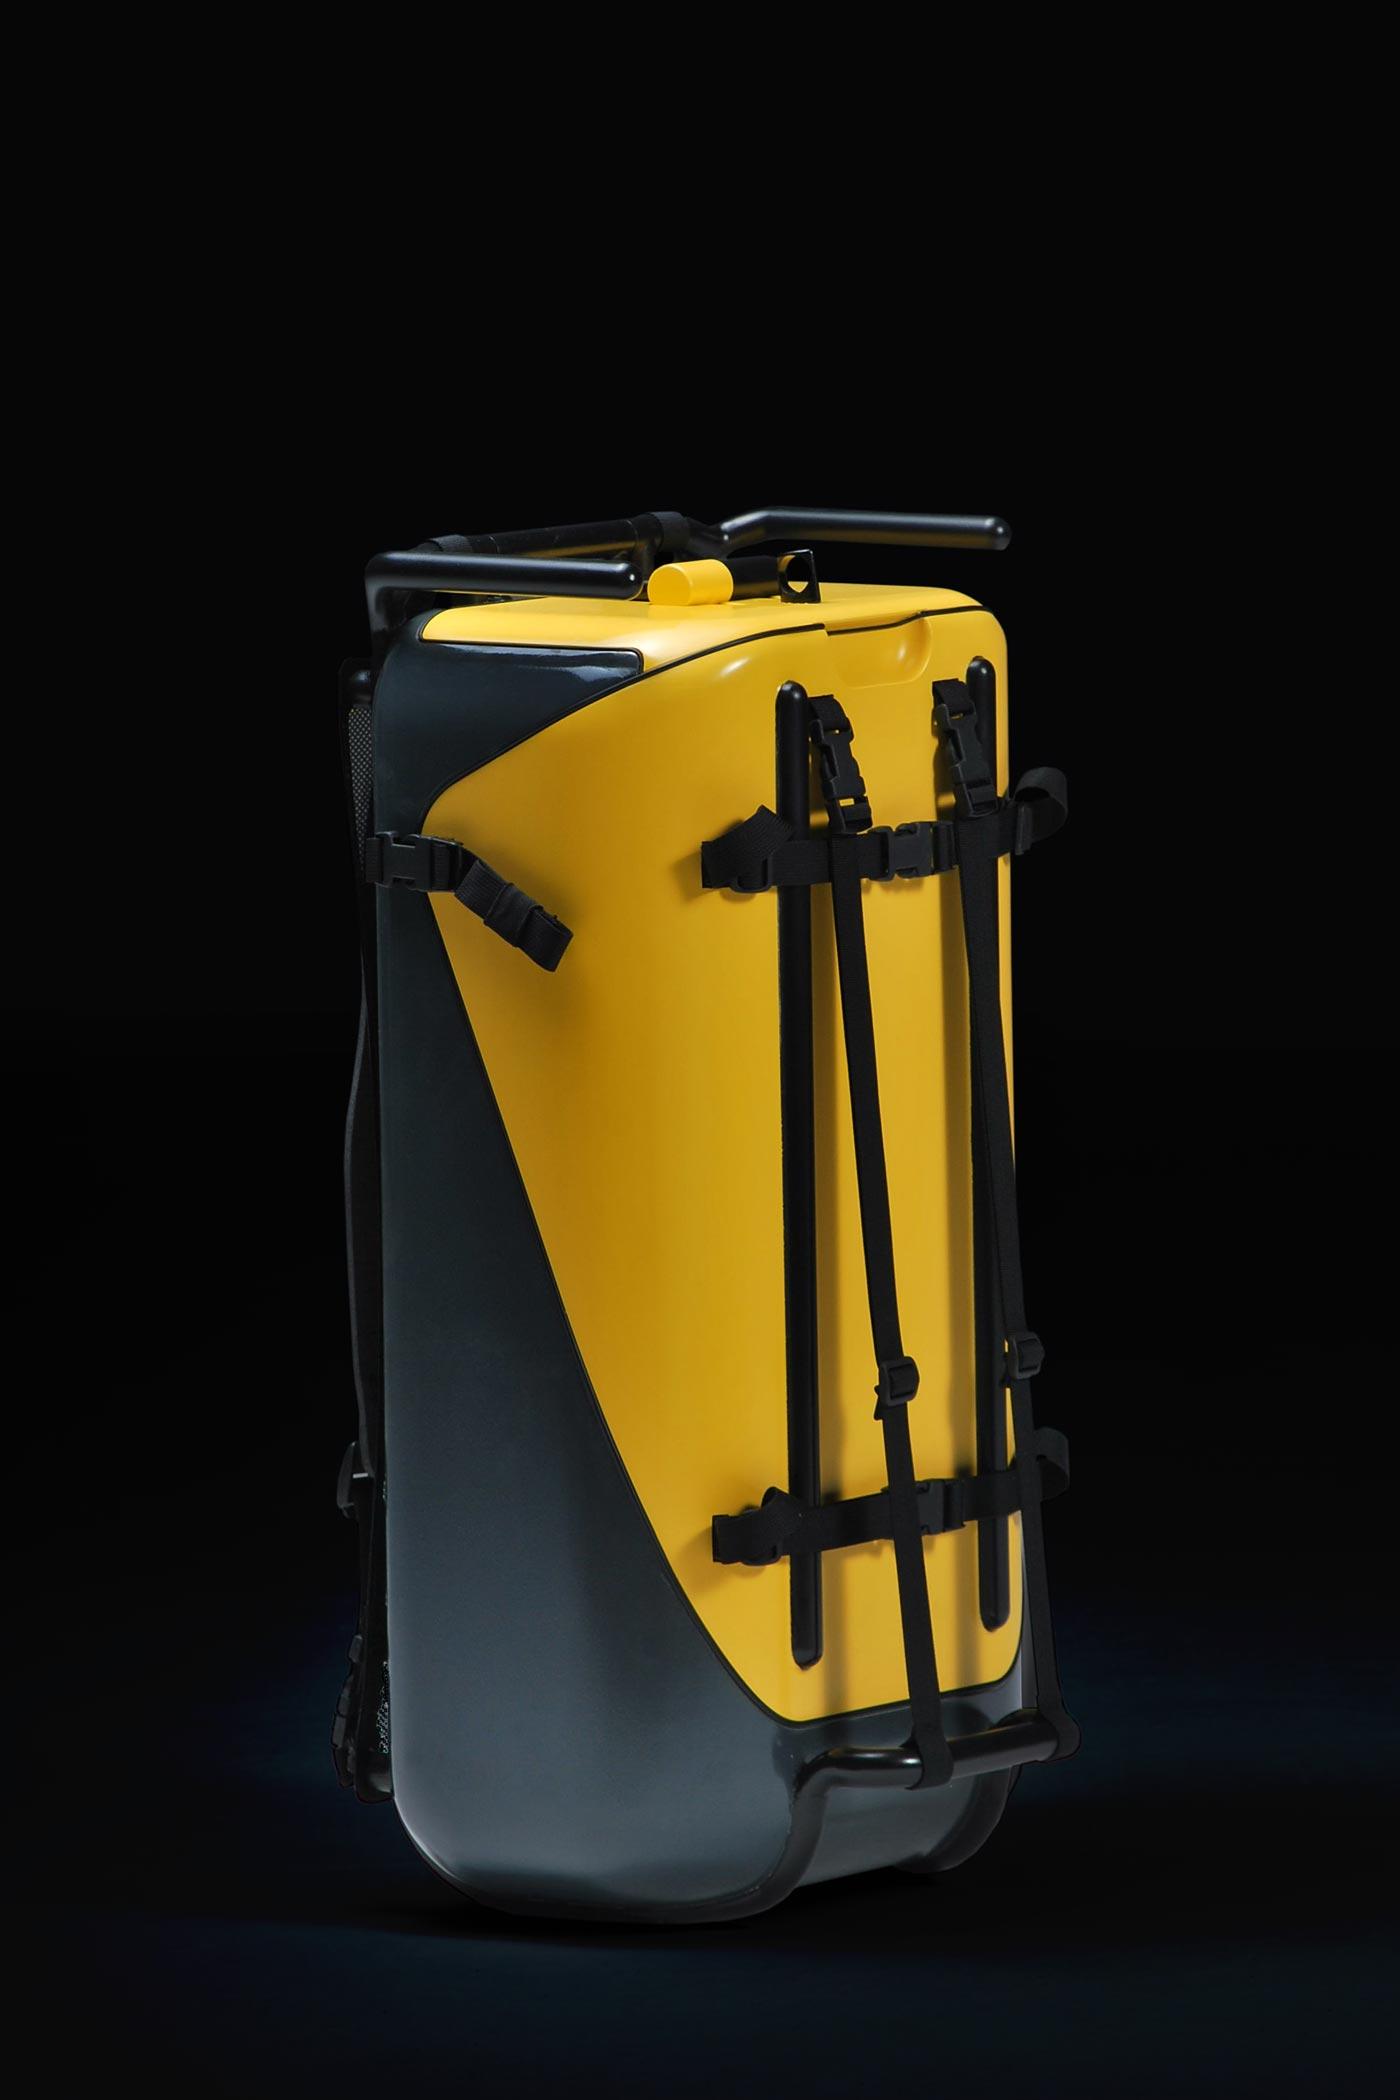 Stadtkoffer mockup by WACH designstudio side-view